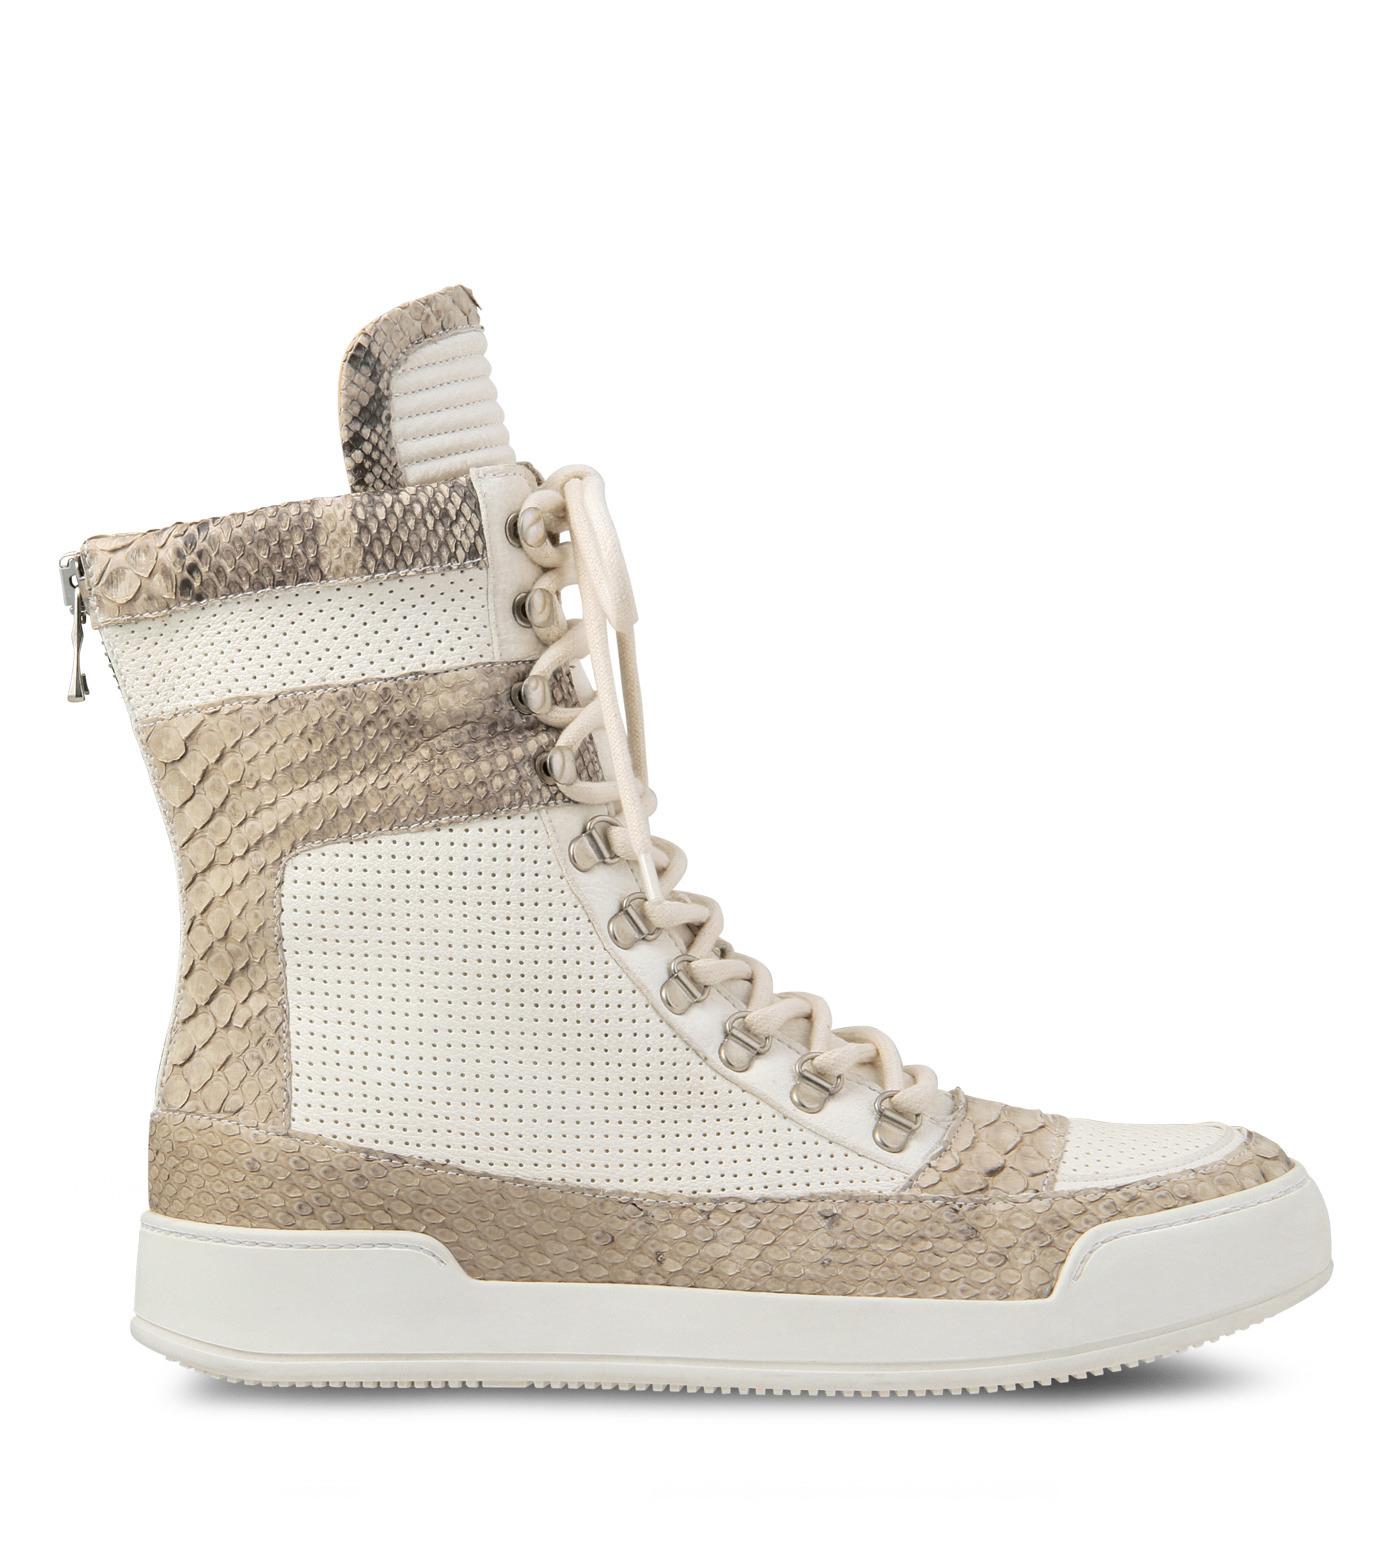 Balmain(バルマン)のHi cut sneaker-WHITE-T306-C189-4 拡大詳細画像1